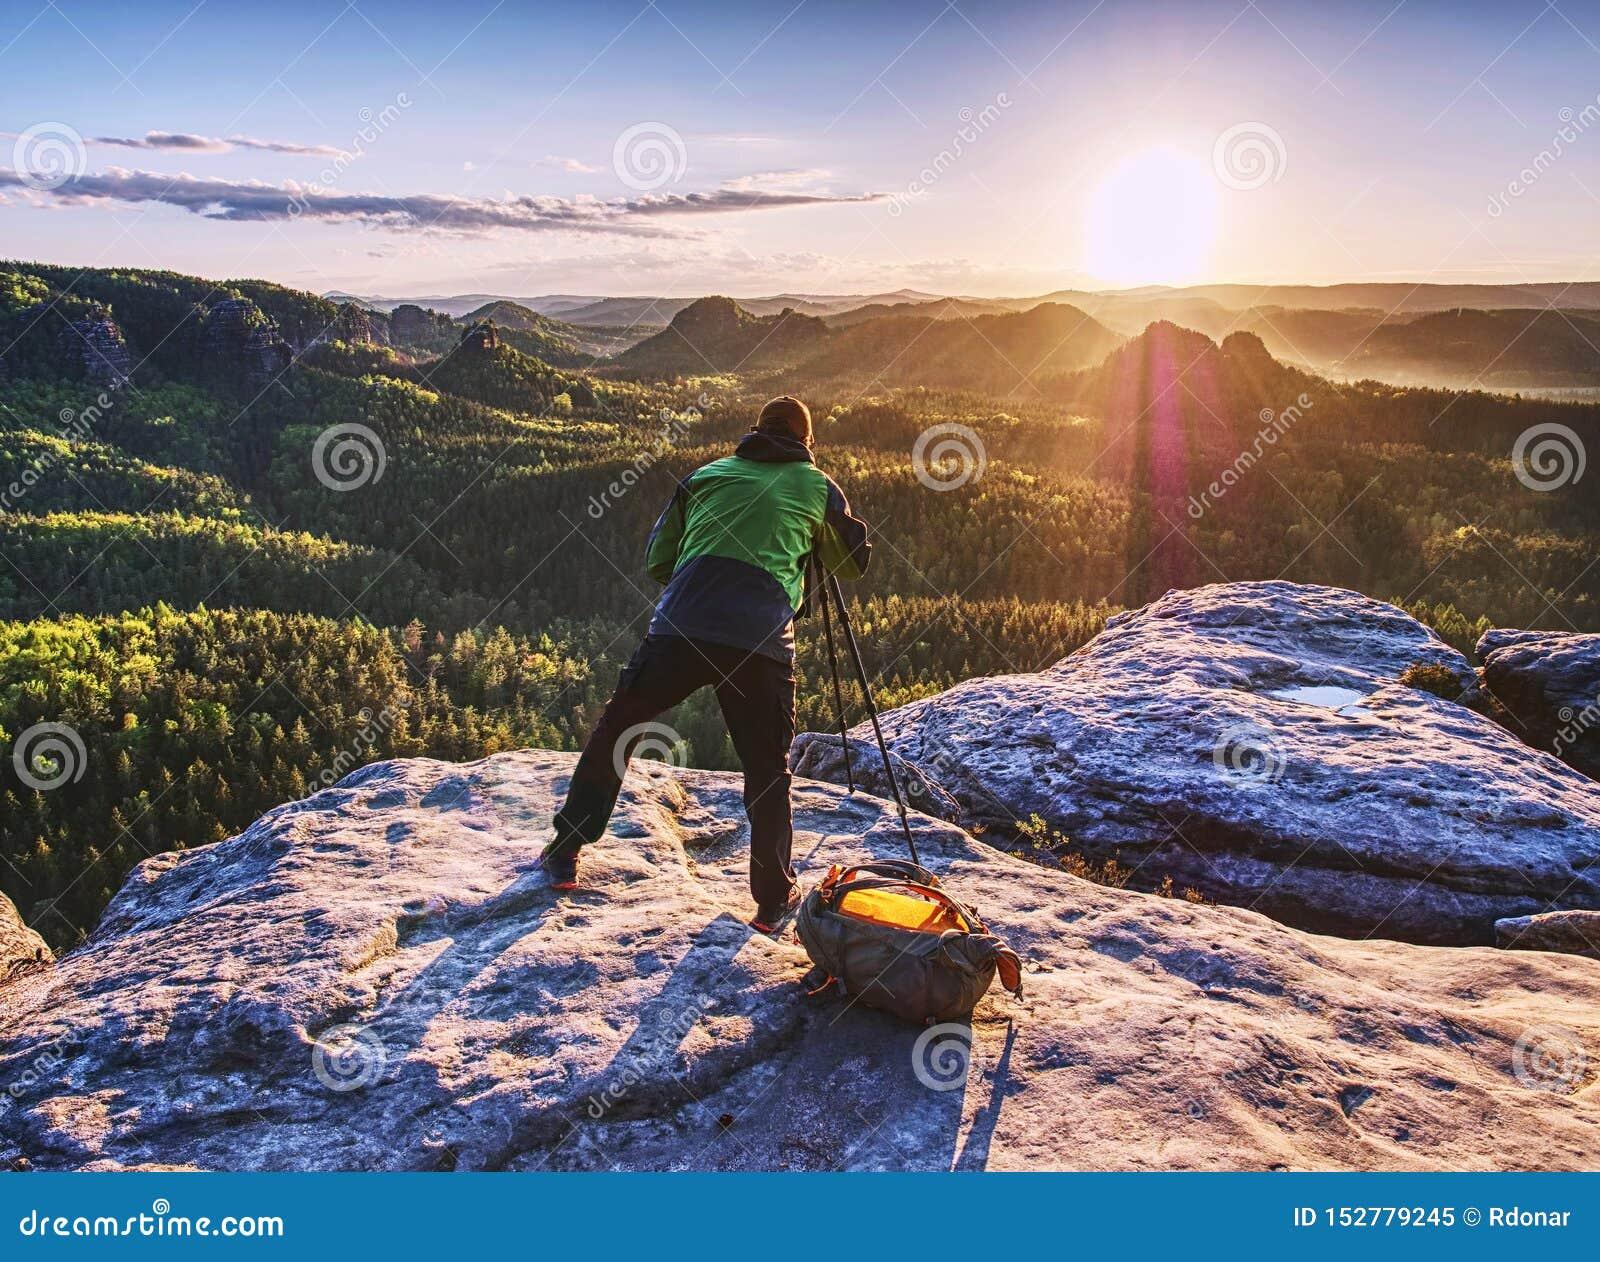 Artist set camera and tripod to photograph sunrise on summit